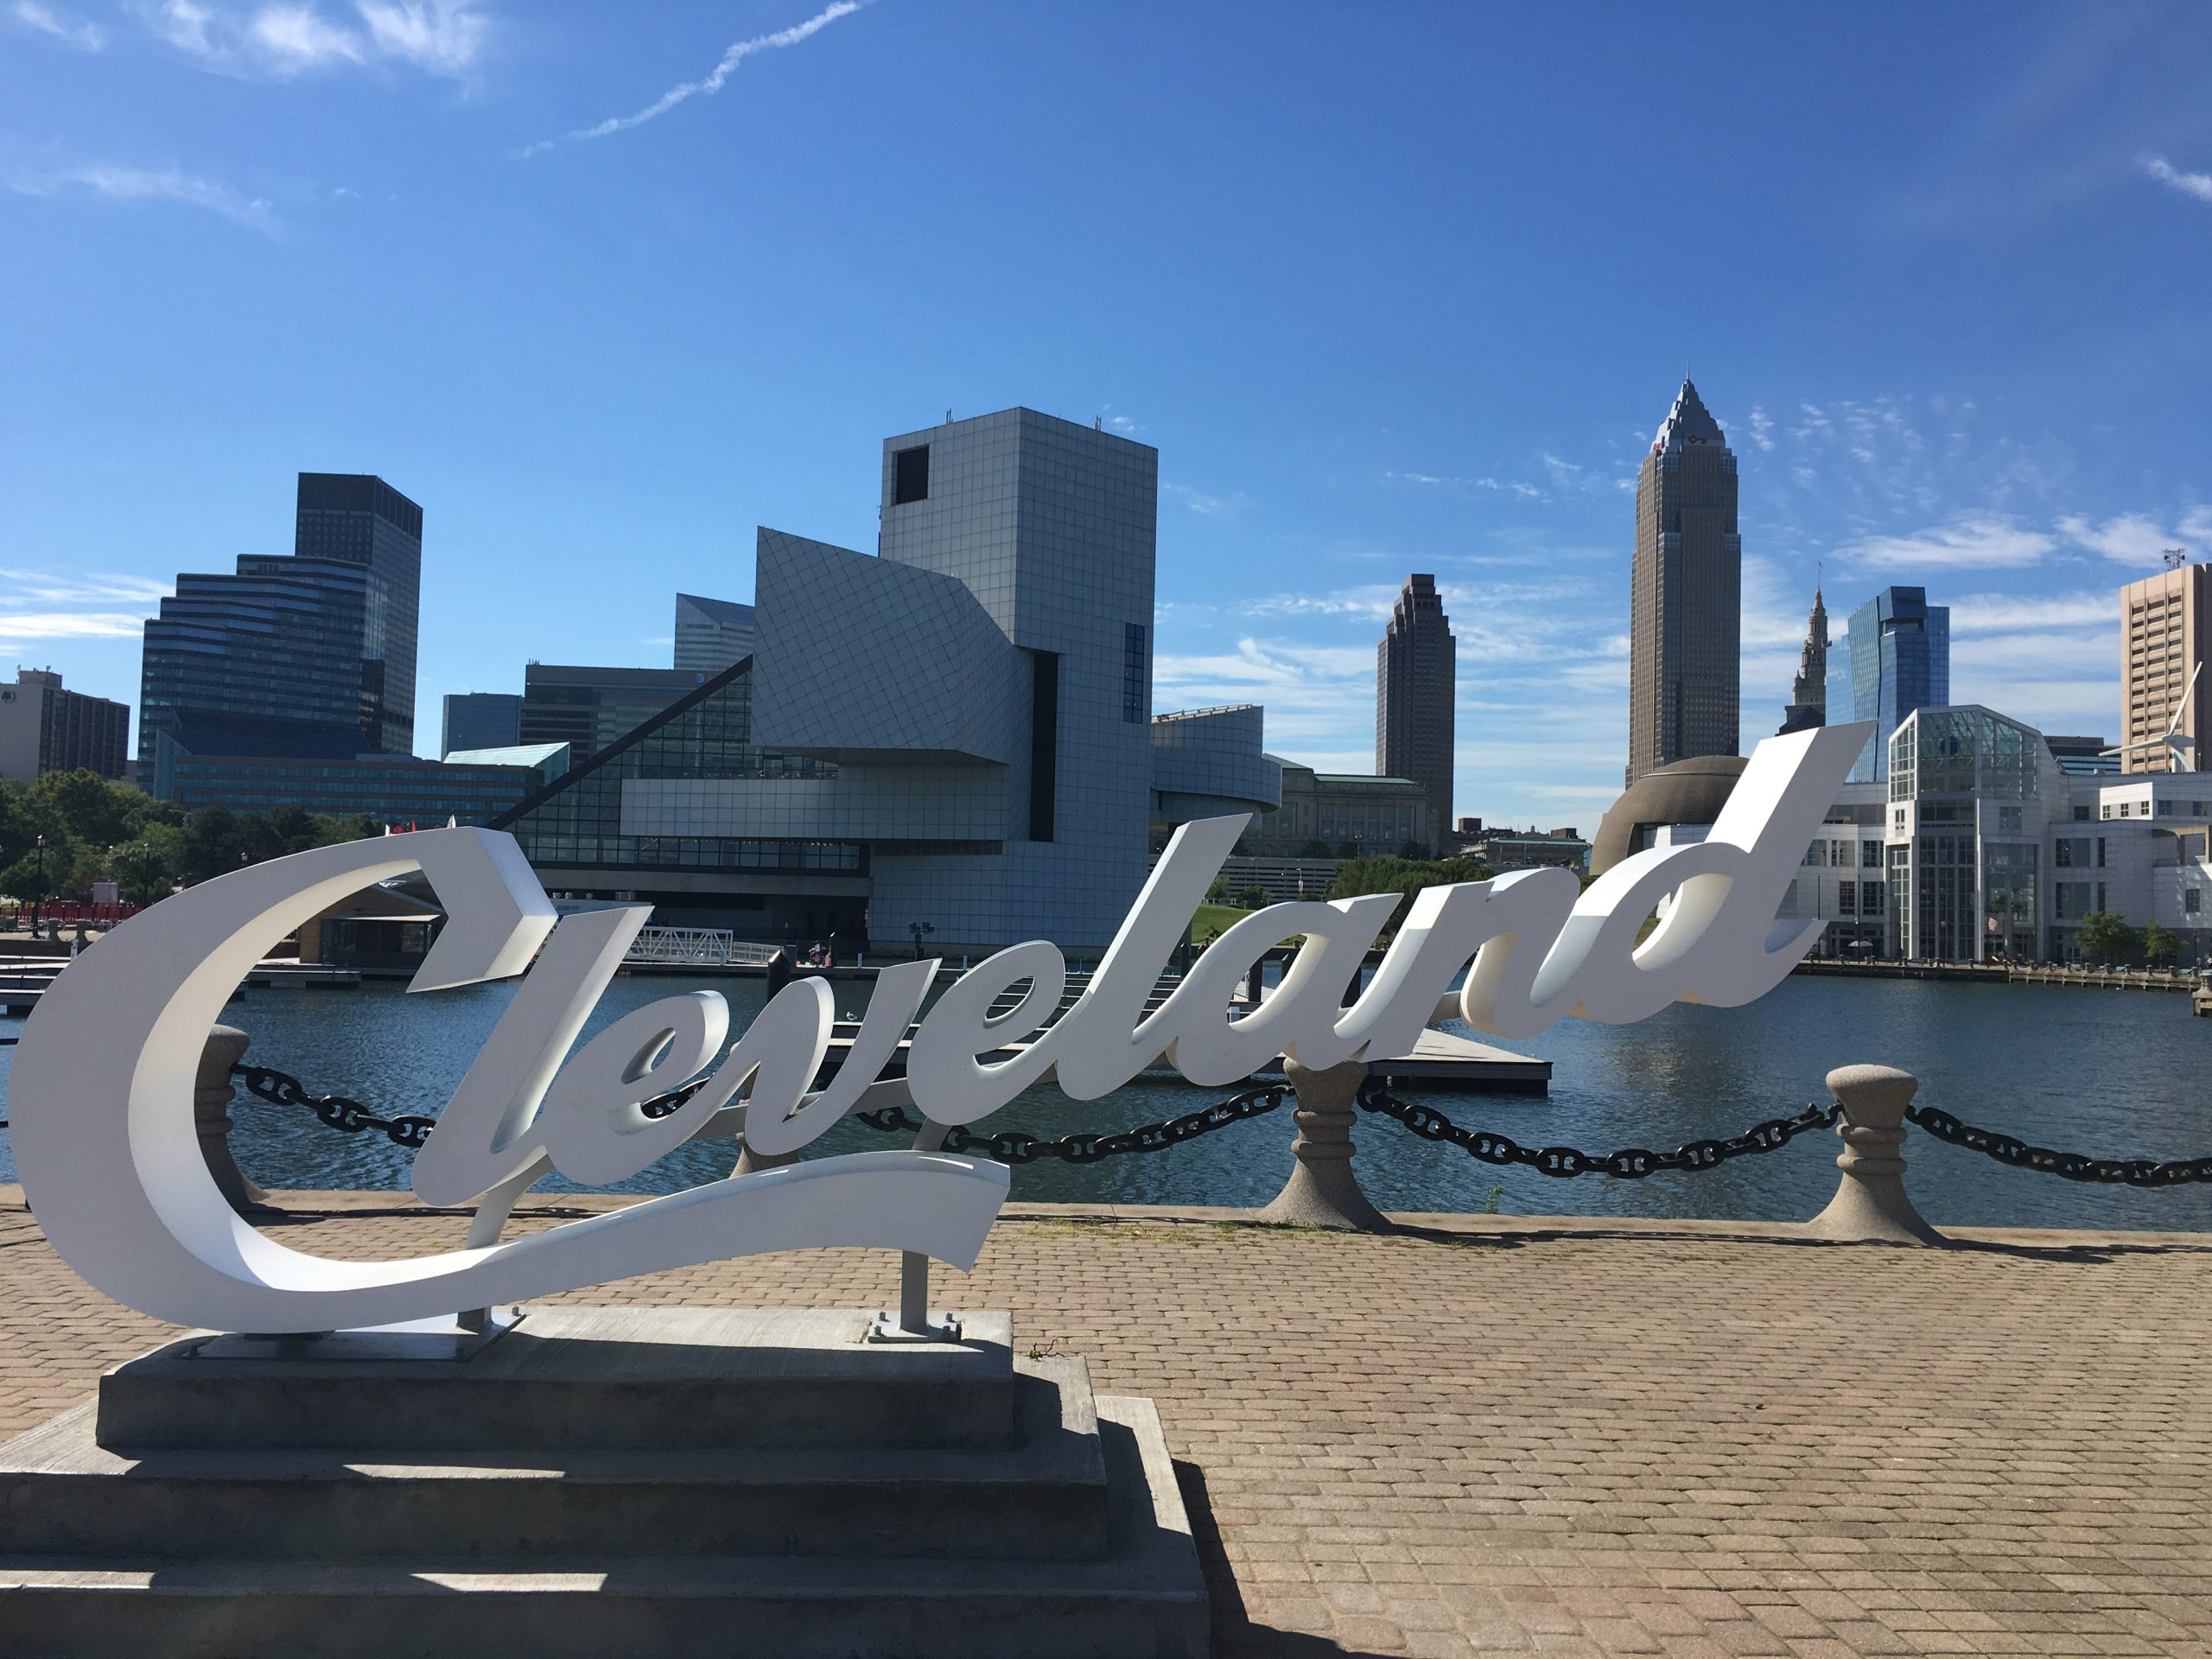 IBEW Local 38 - Cleveland, Ohio